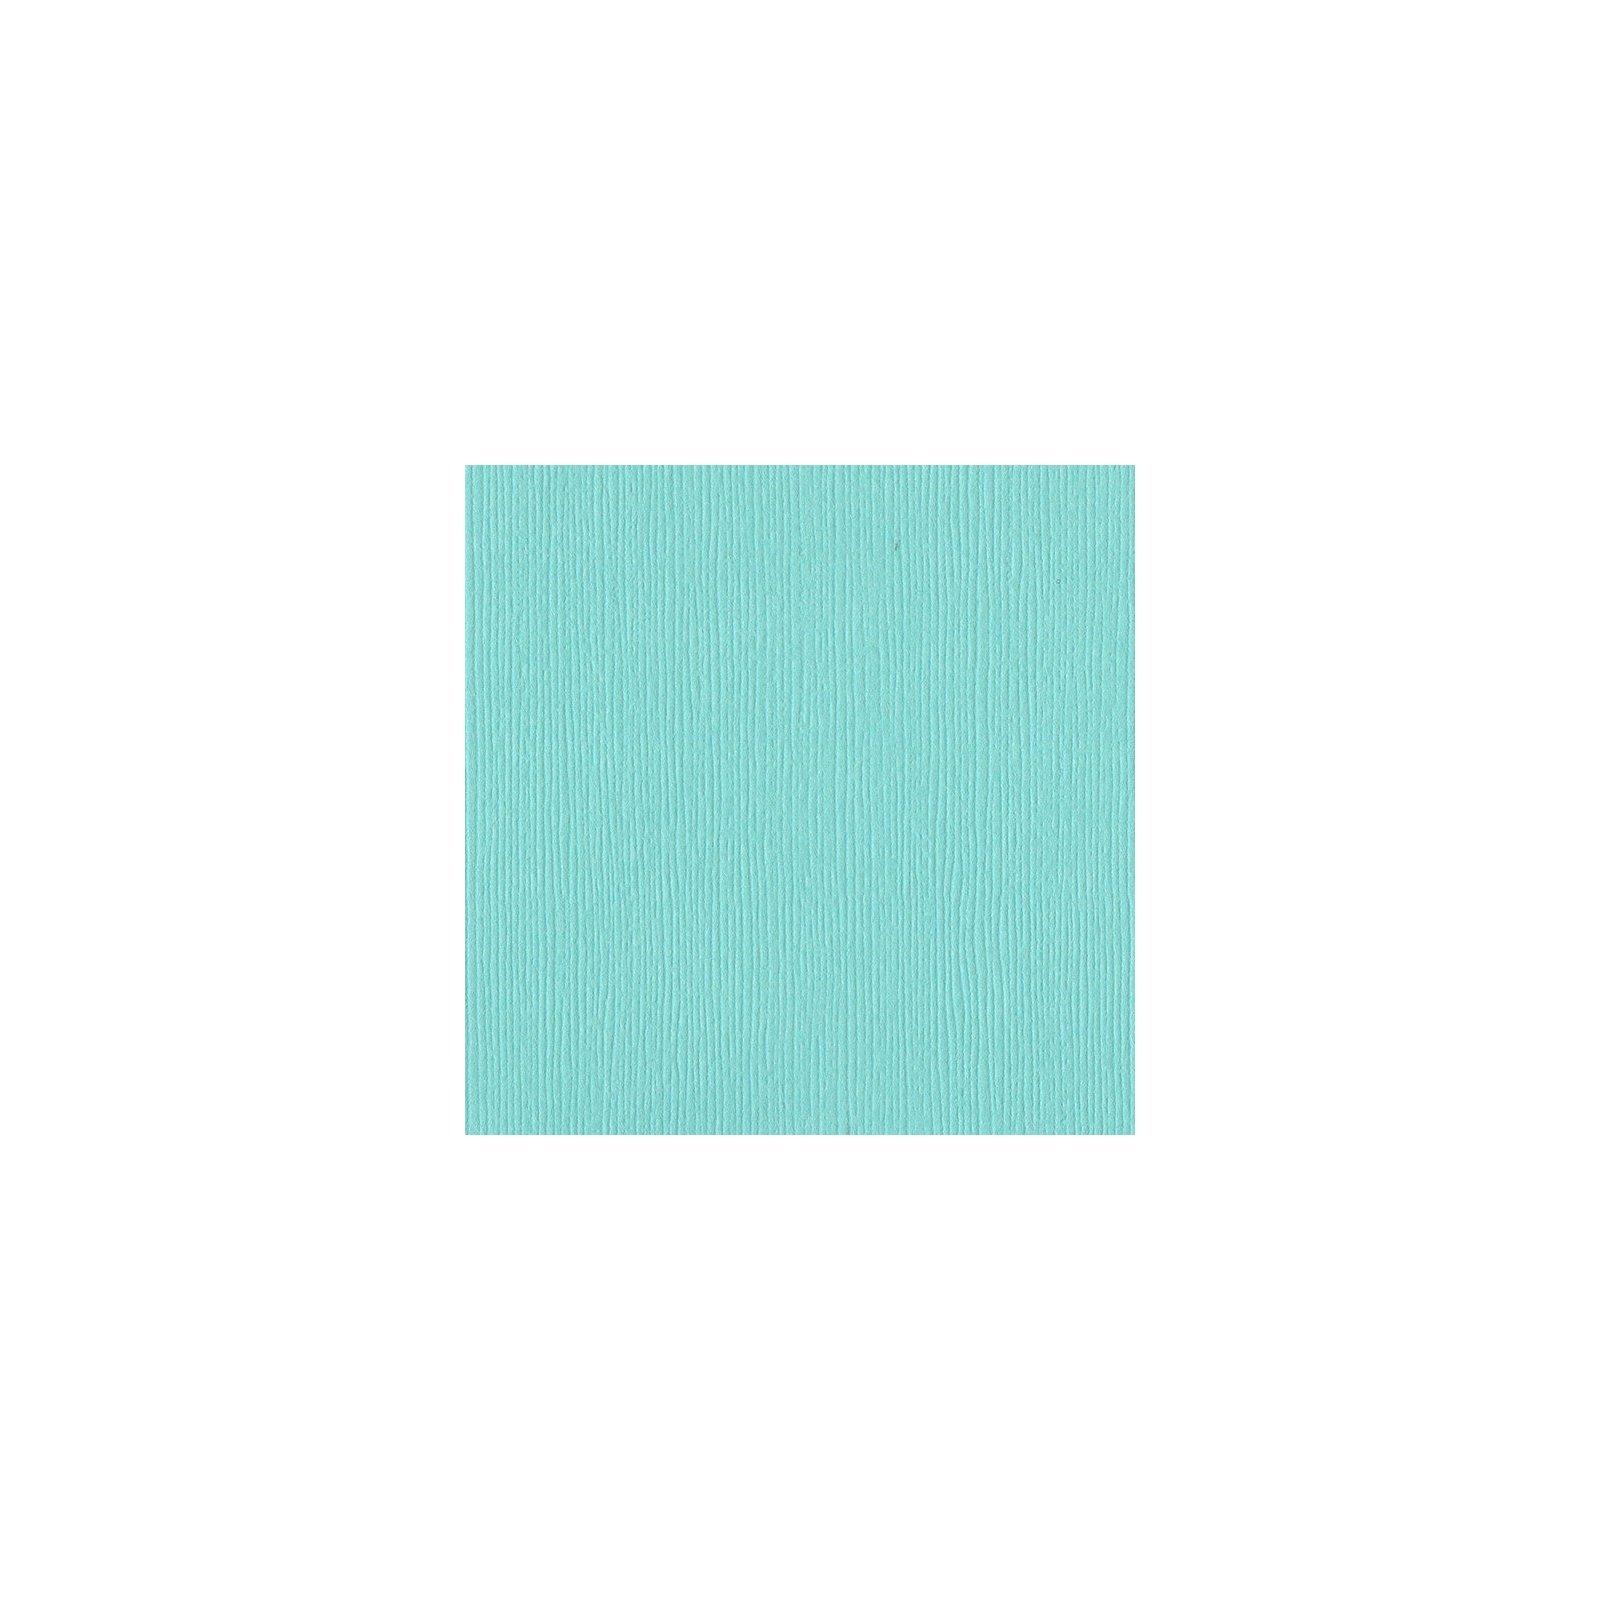 Papier bleu d'eau - Patina - Fourz - Bazzill Basics Paper